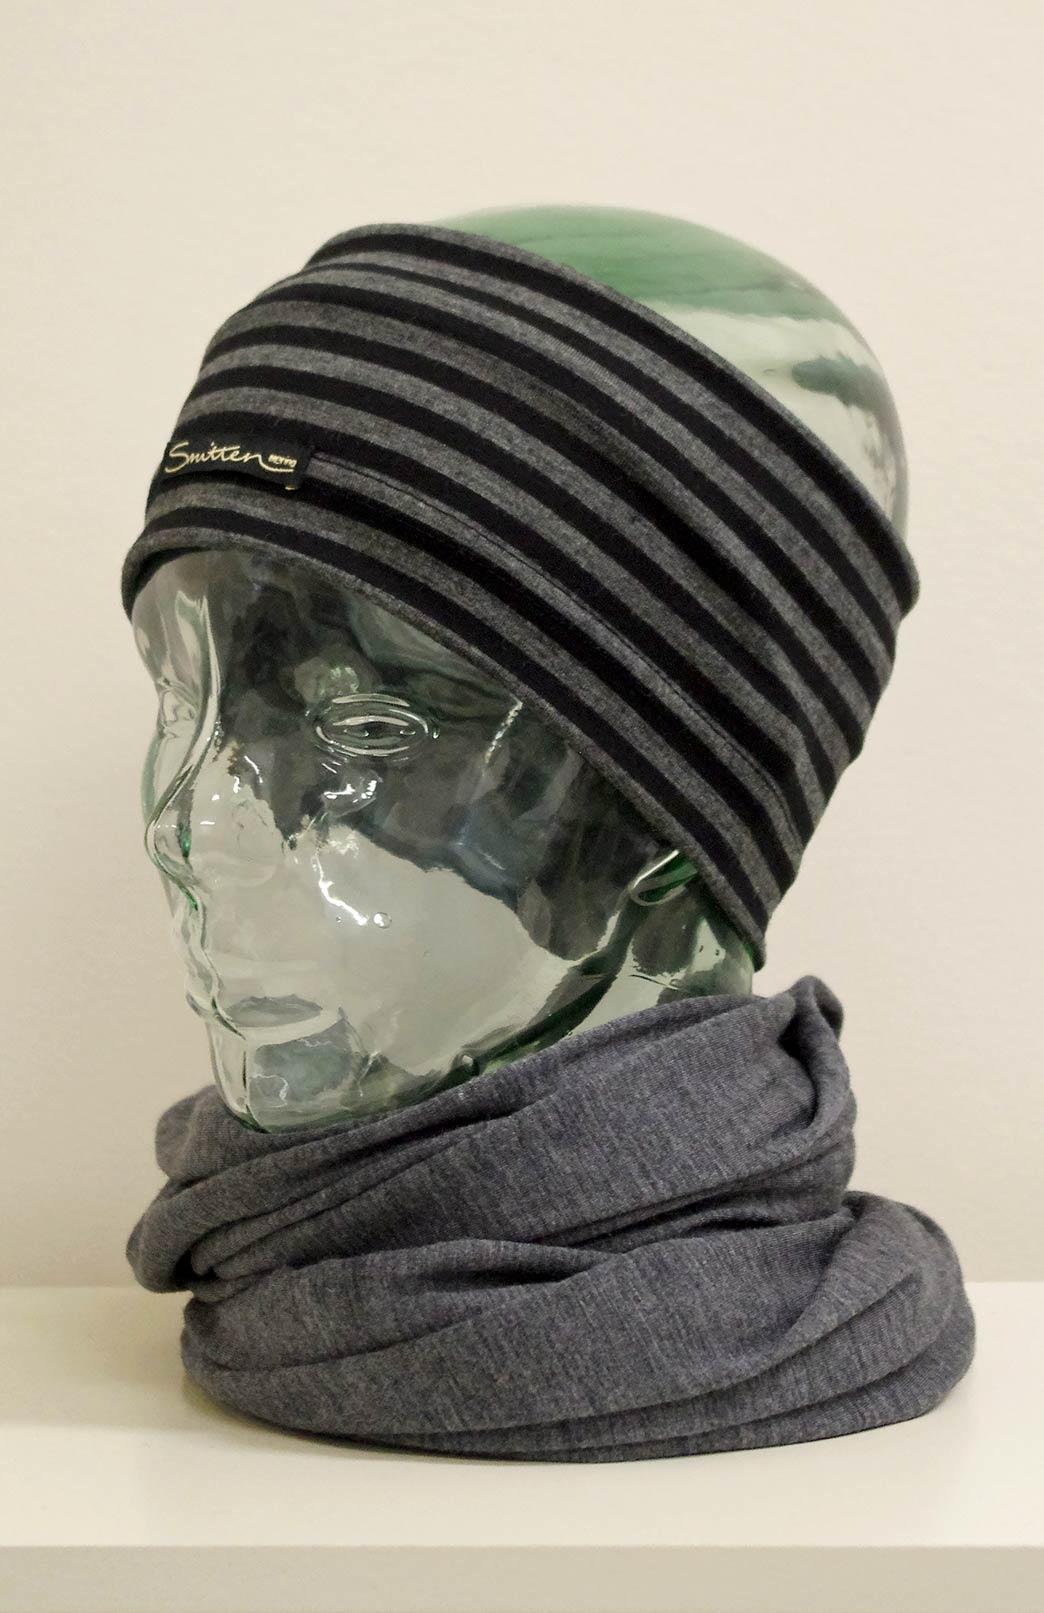 Headband / Ear Warmer - Unisex Black and Grey Stripe Merino Wool Headband and Ear Warmer - Smitten Merino Tasmania Australia